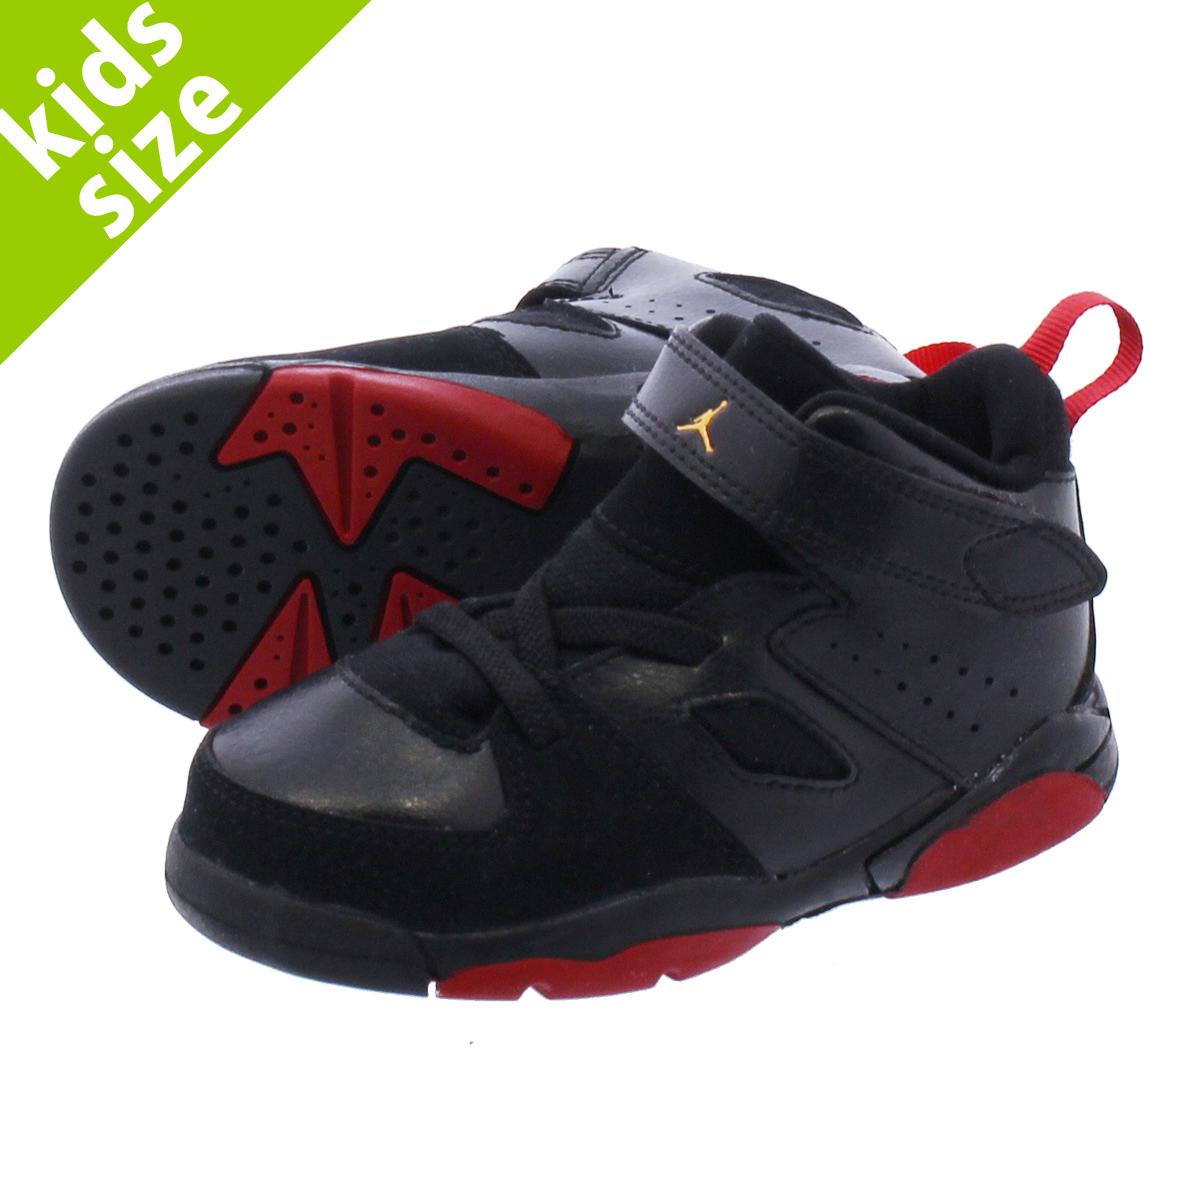 e0951dc7ad8f4b NIKE JORDAN FLIGHT CLUB 91 TD Nike Jordan flight club 91 TD BLACK RED  555